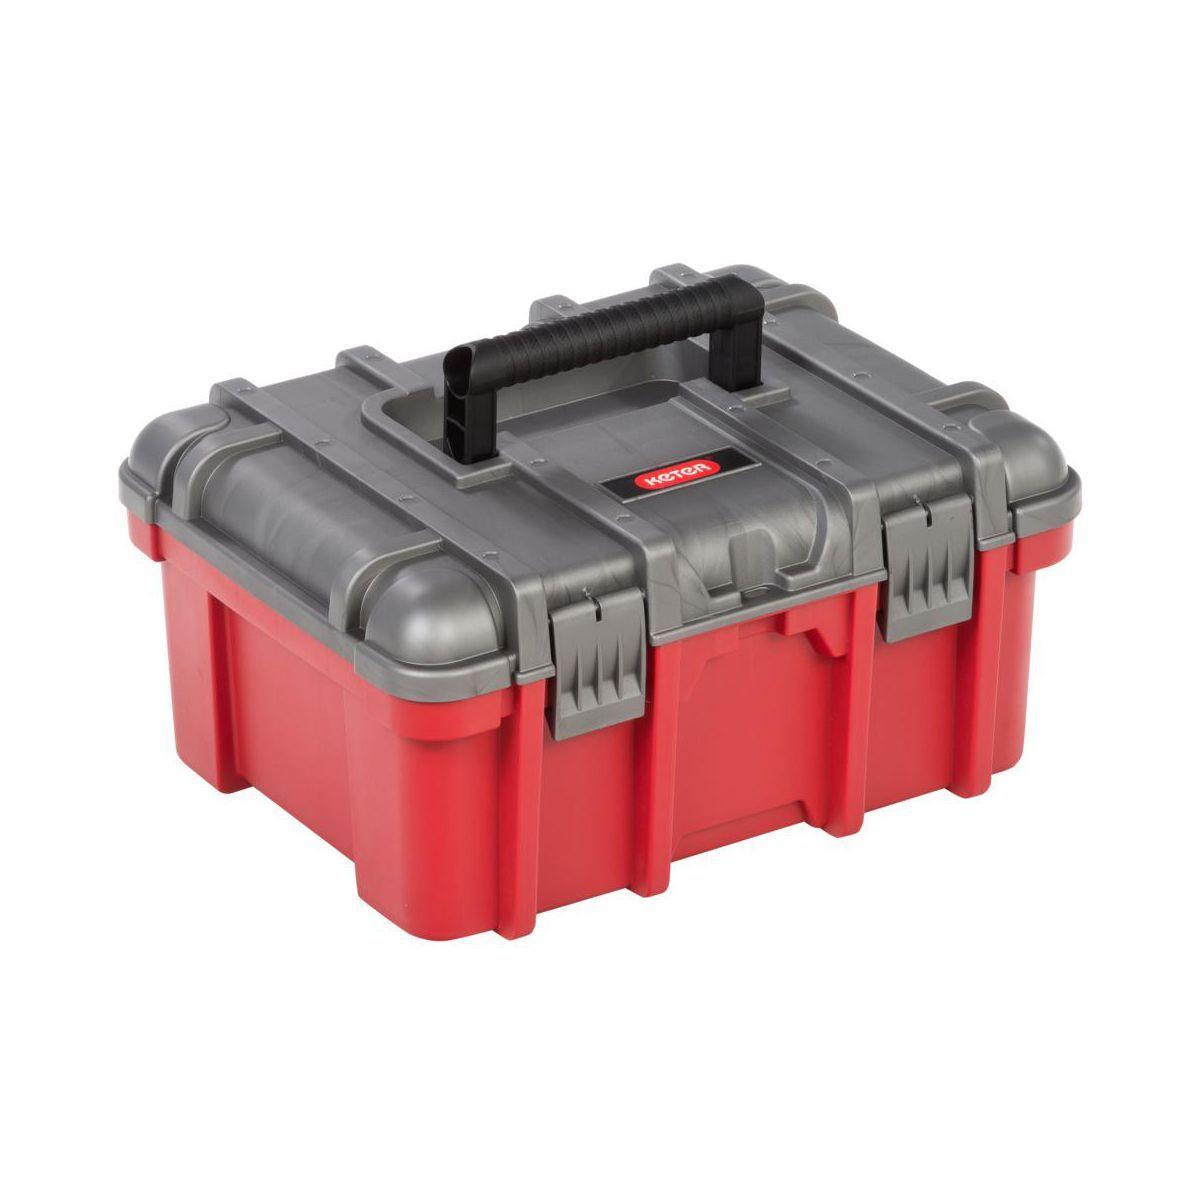 Skrzynka Na Narzedzia Master Pro Wide Toolbox 16 Keter Tool Box Master Luggage